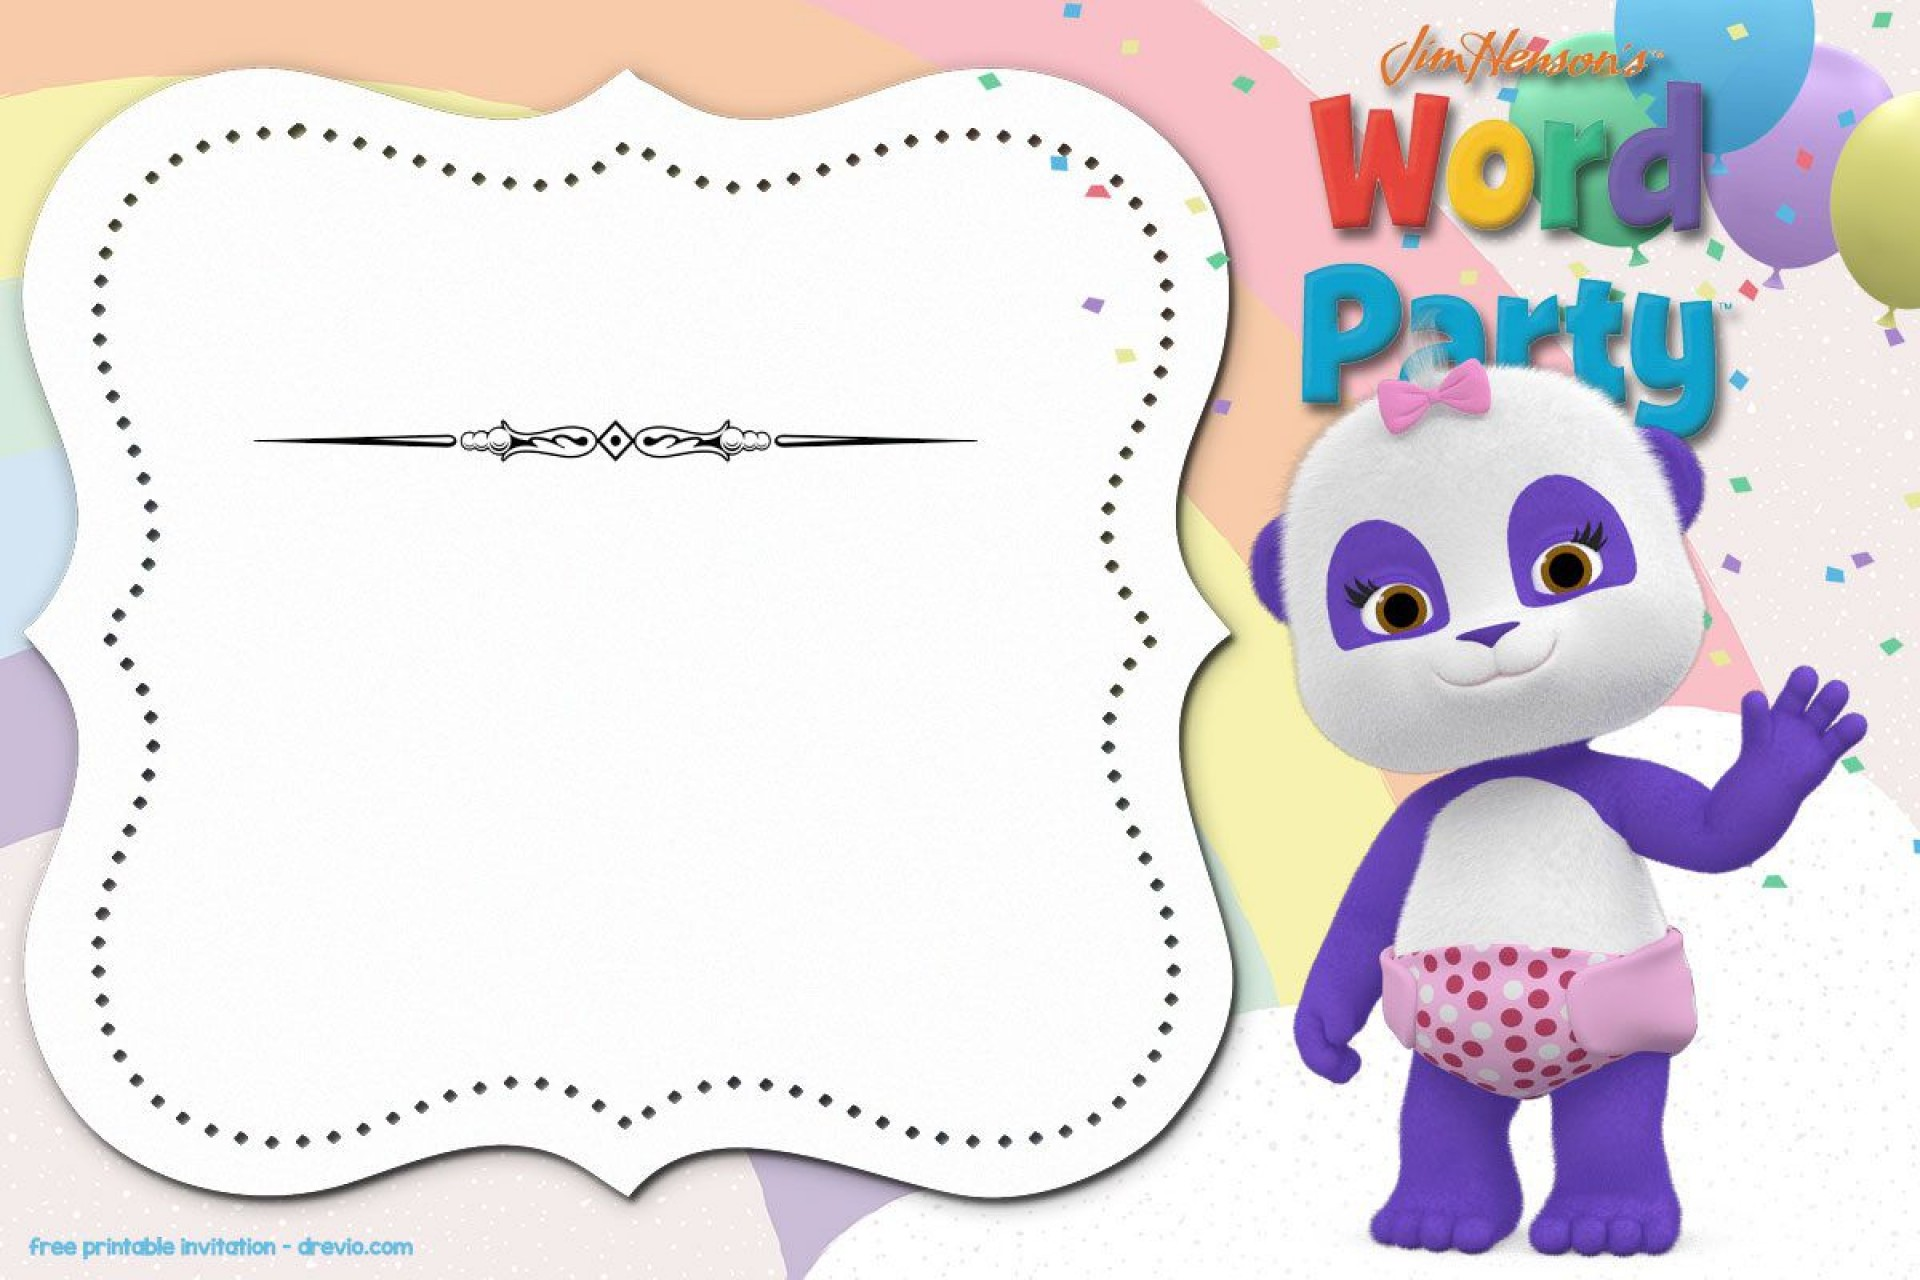 009 Unforgettable Party Invitation Template Word Concept  Dinner Summer Wording Sample Unicorn Birthday1920